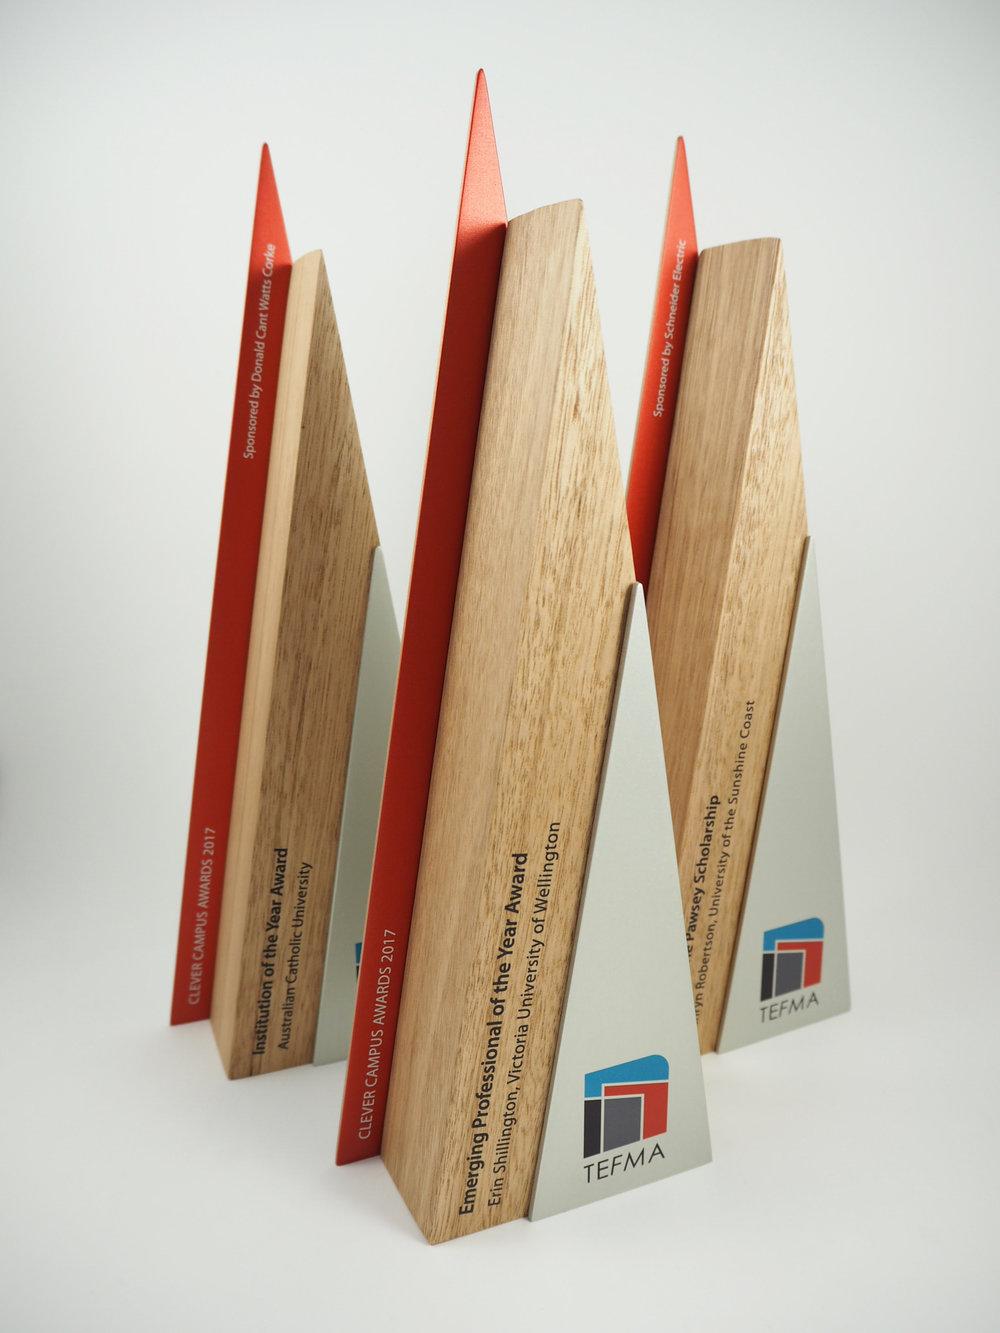 tefma-awards-timber-eco-aluminium-trophy-03.jpg